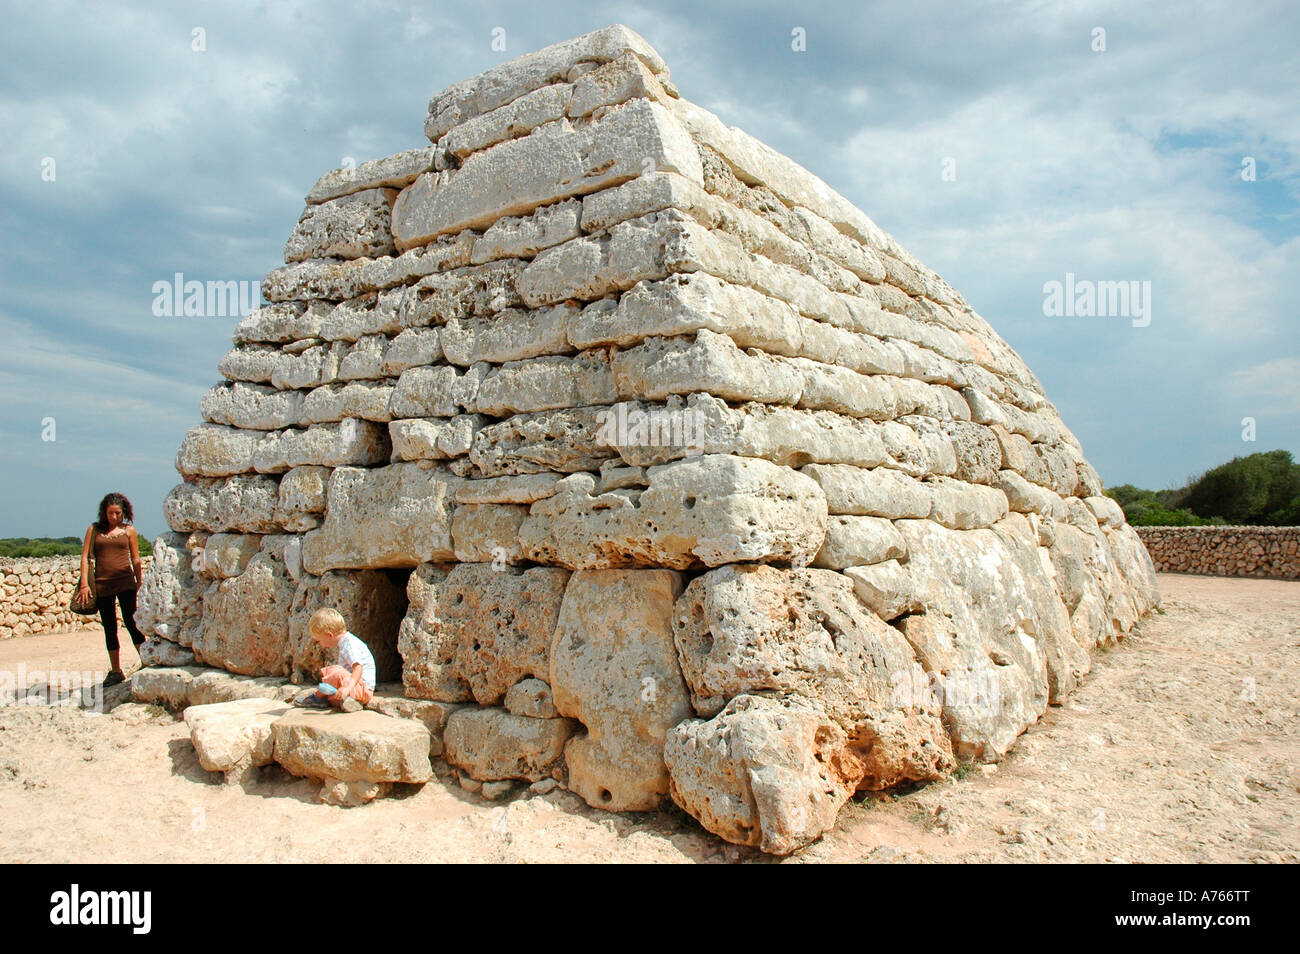 Naveta des Tudons chamber tomb MENORCA Balearic Islands Spain - Stock Image